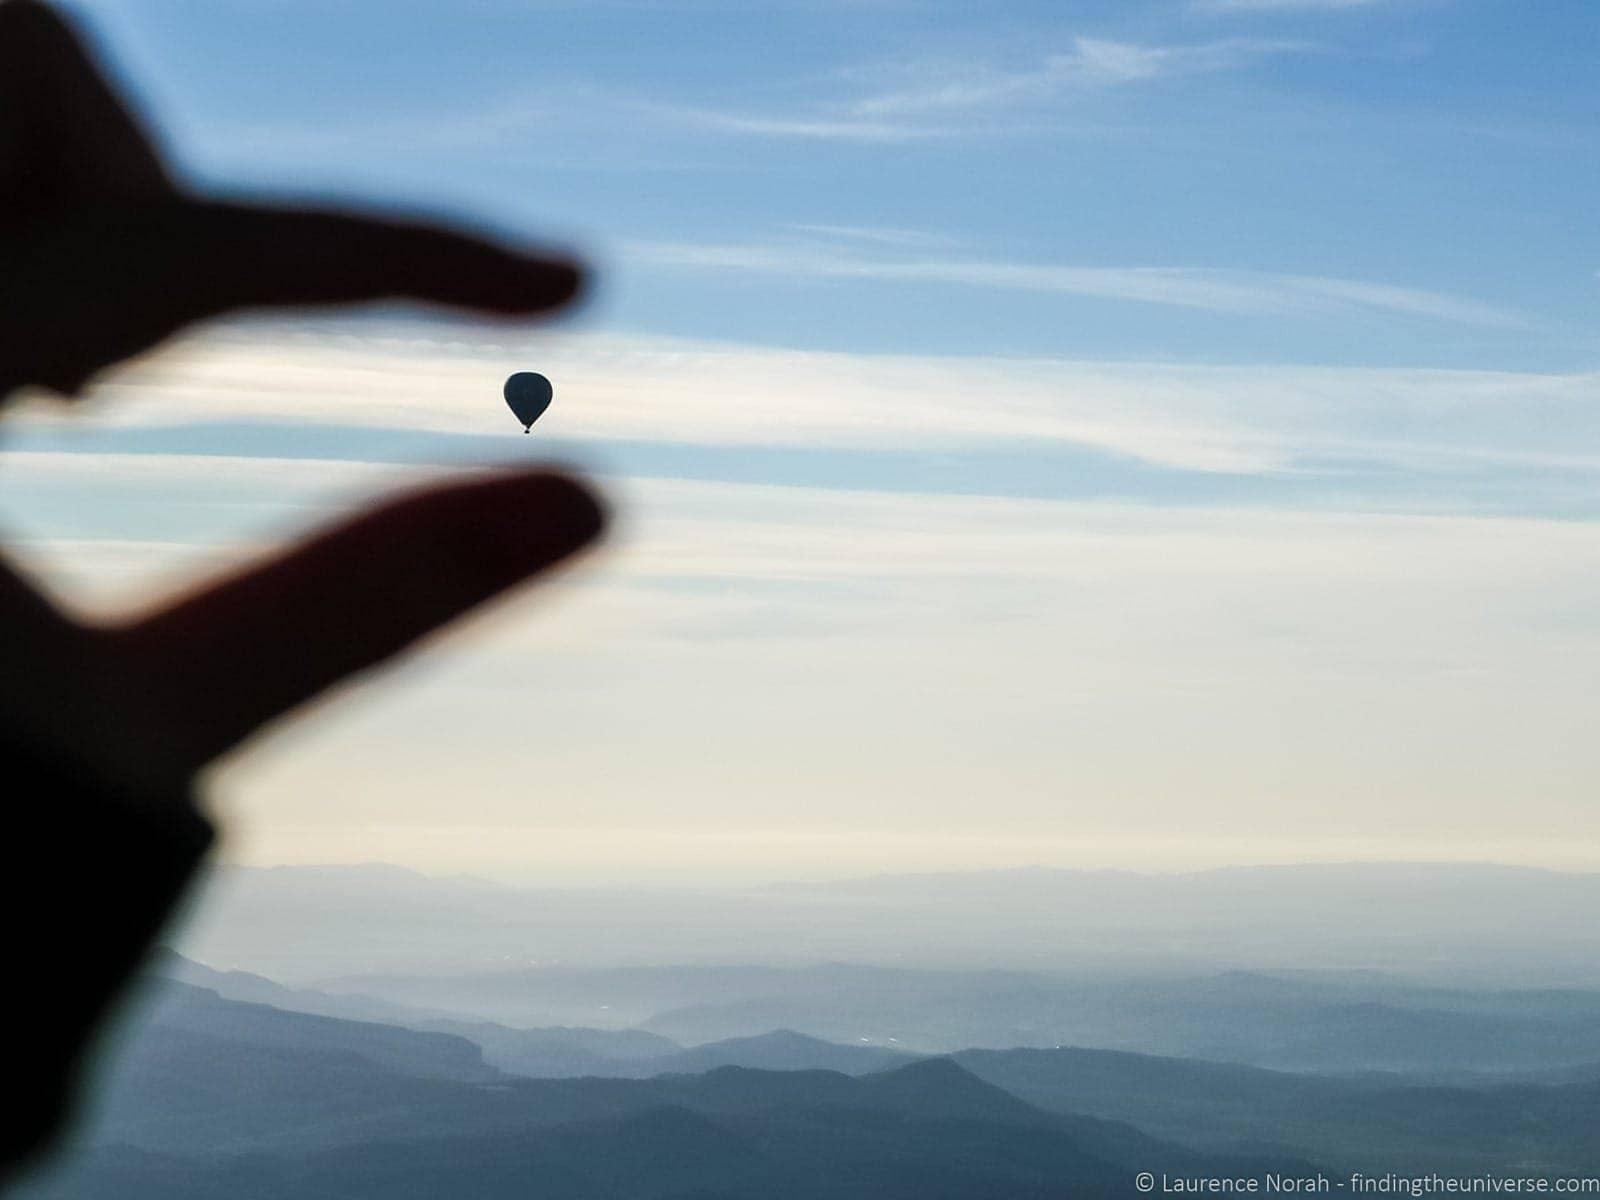 Balloon Vol de Coloms Costa Brava 26